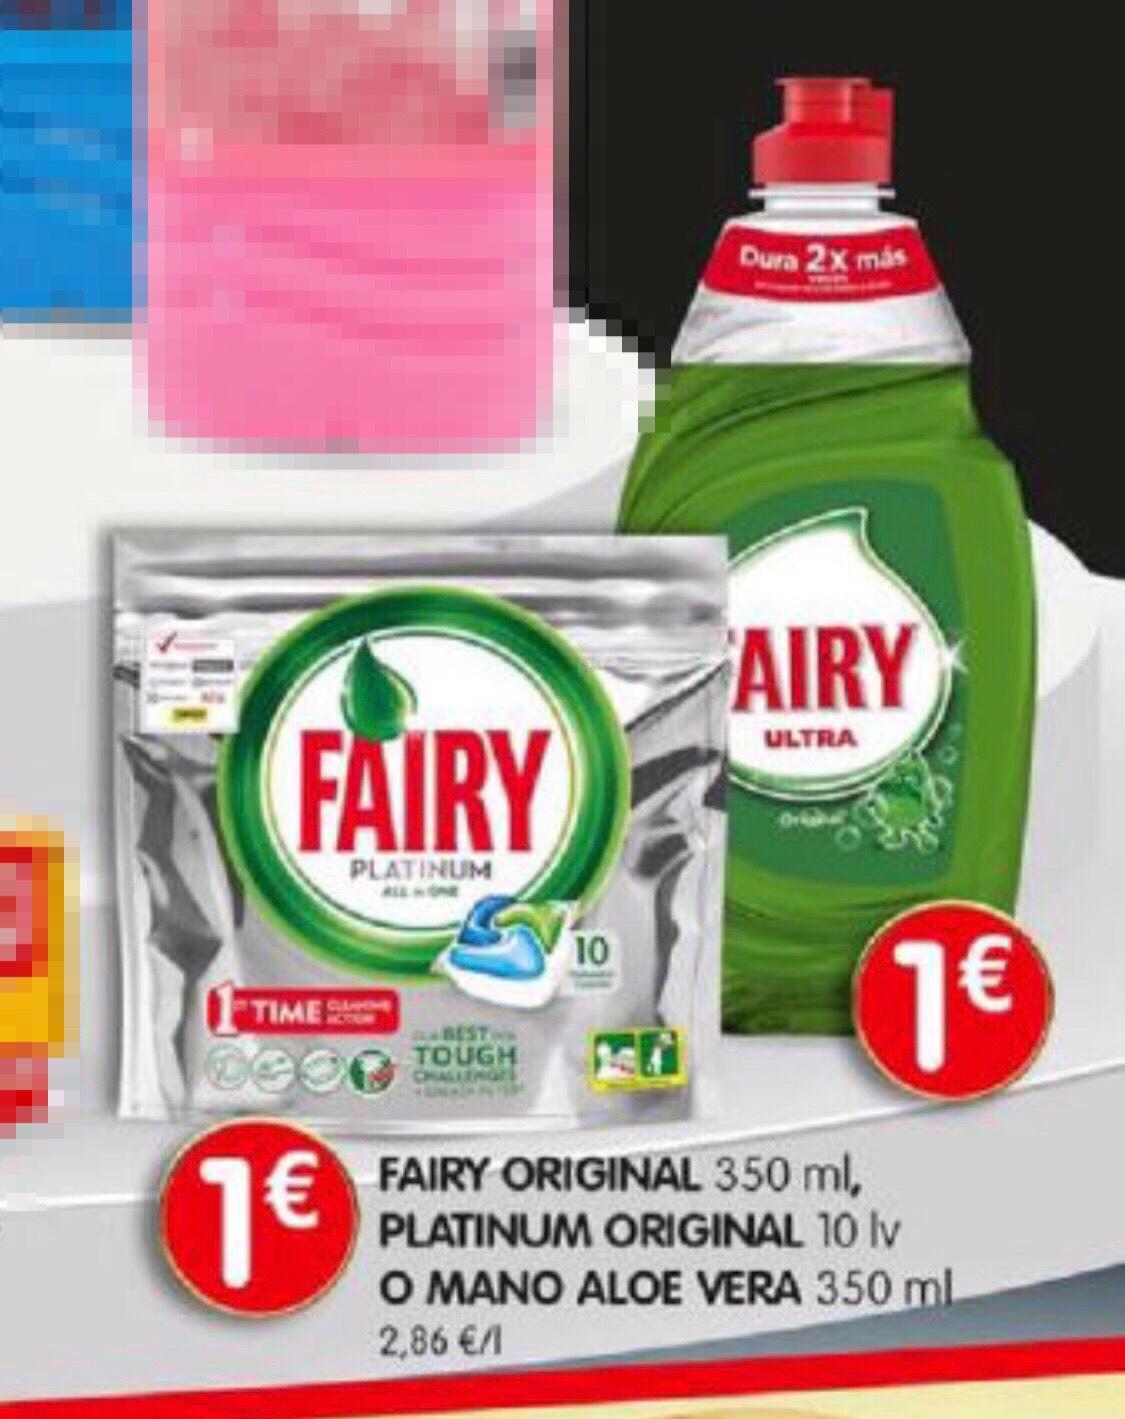 Fairy Platinum lavavajillas (10pastillas 1€!)